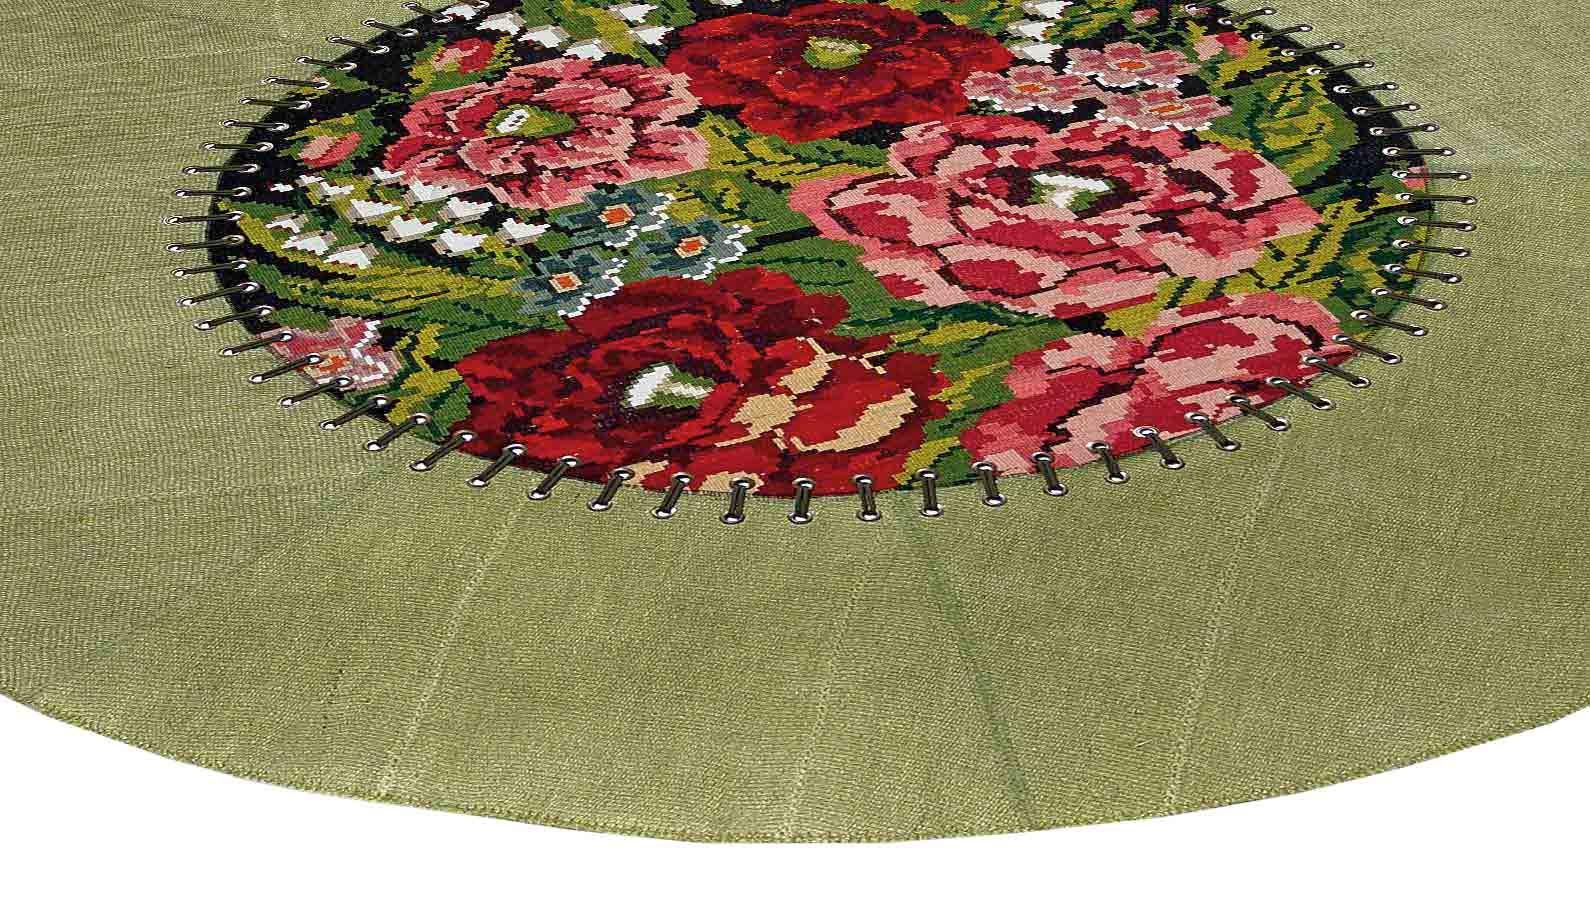 Dandy Strass Fiori green round carpet Tappeti, Fiori e